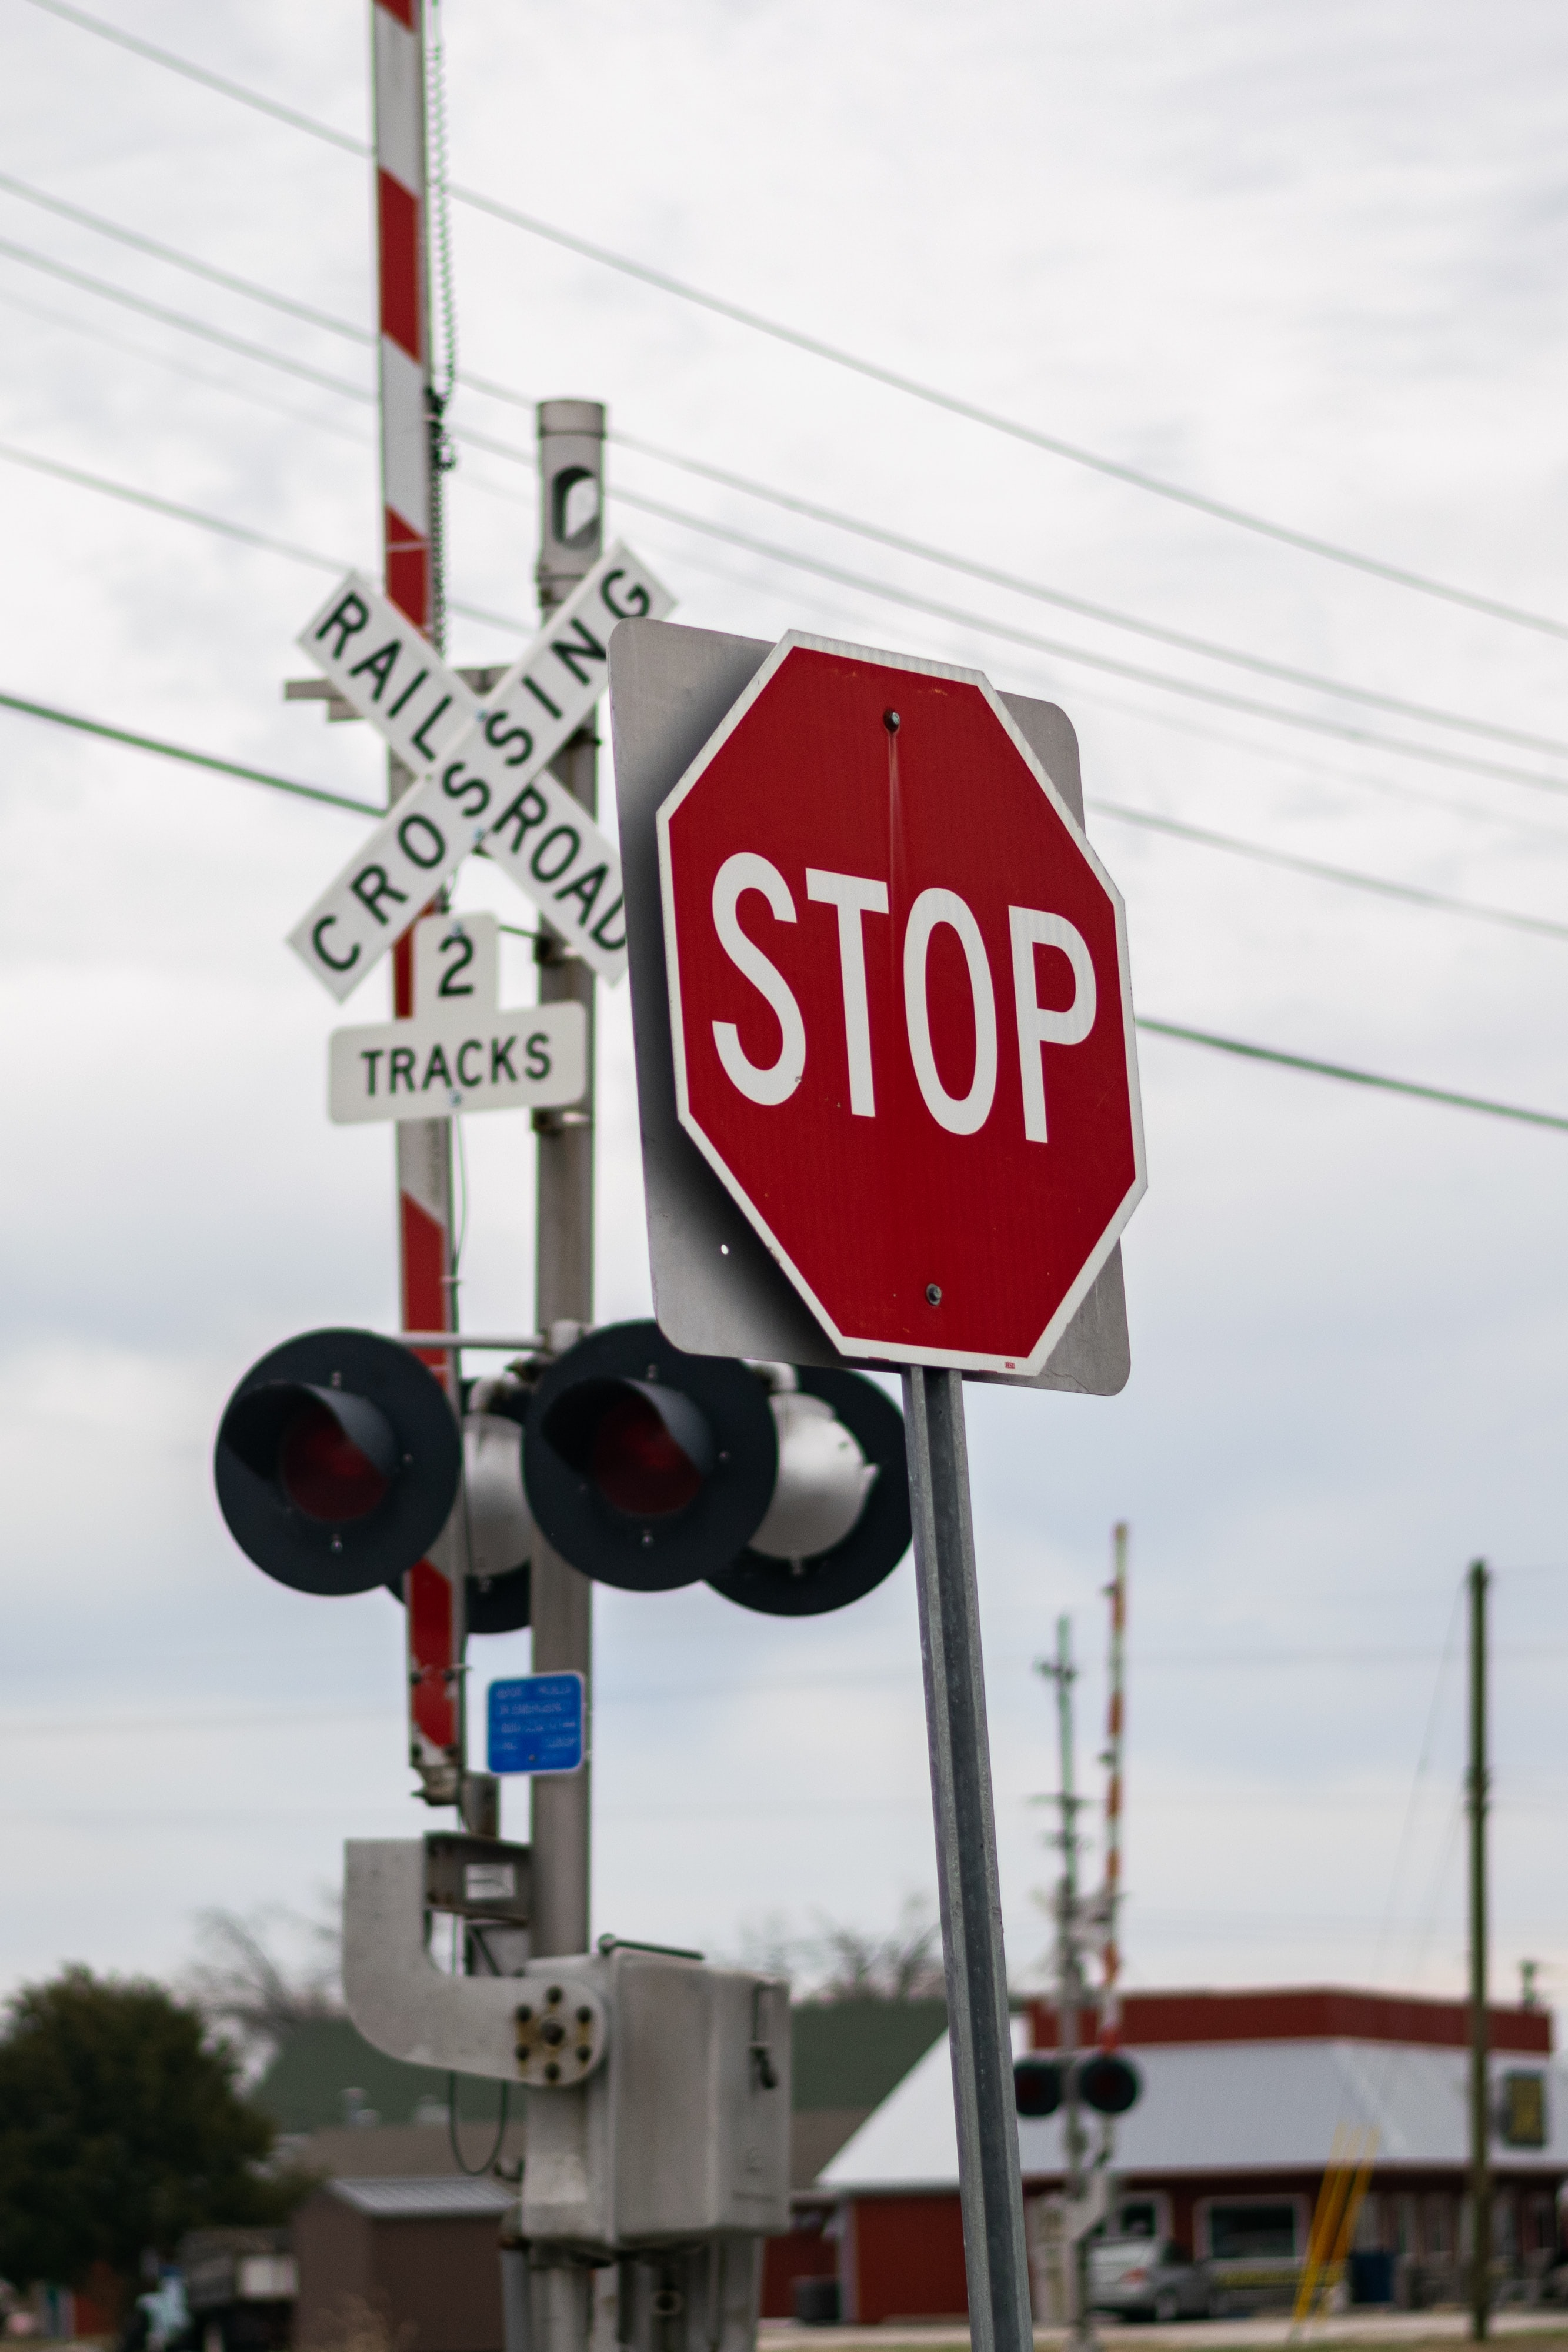 Stop signage near traffic lights